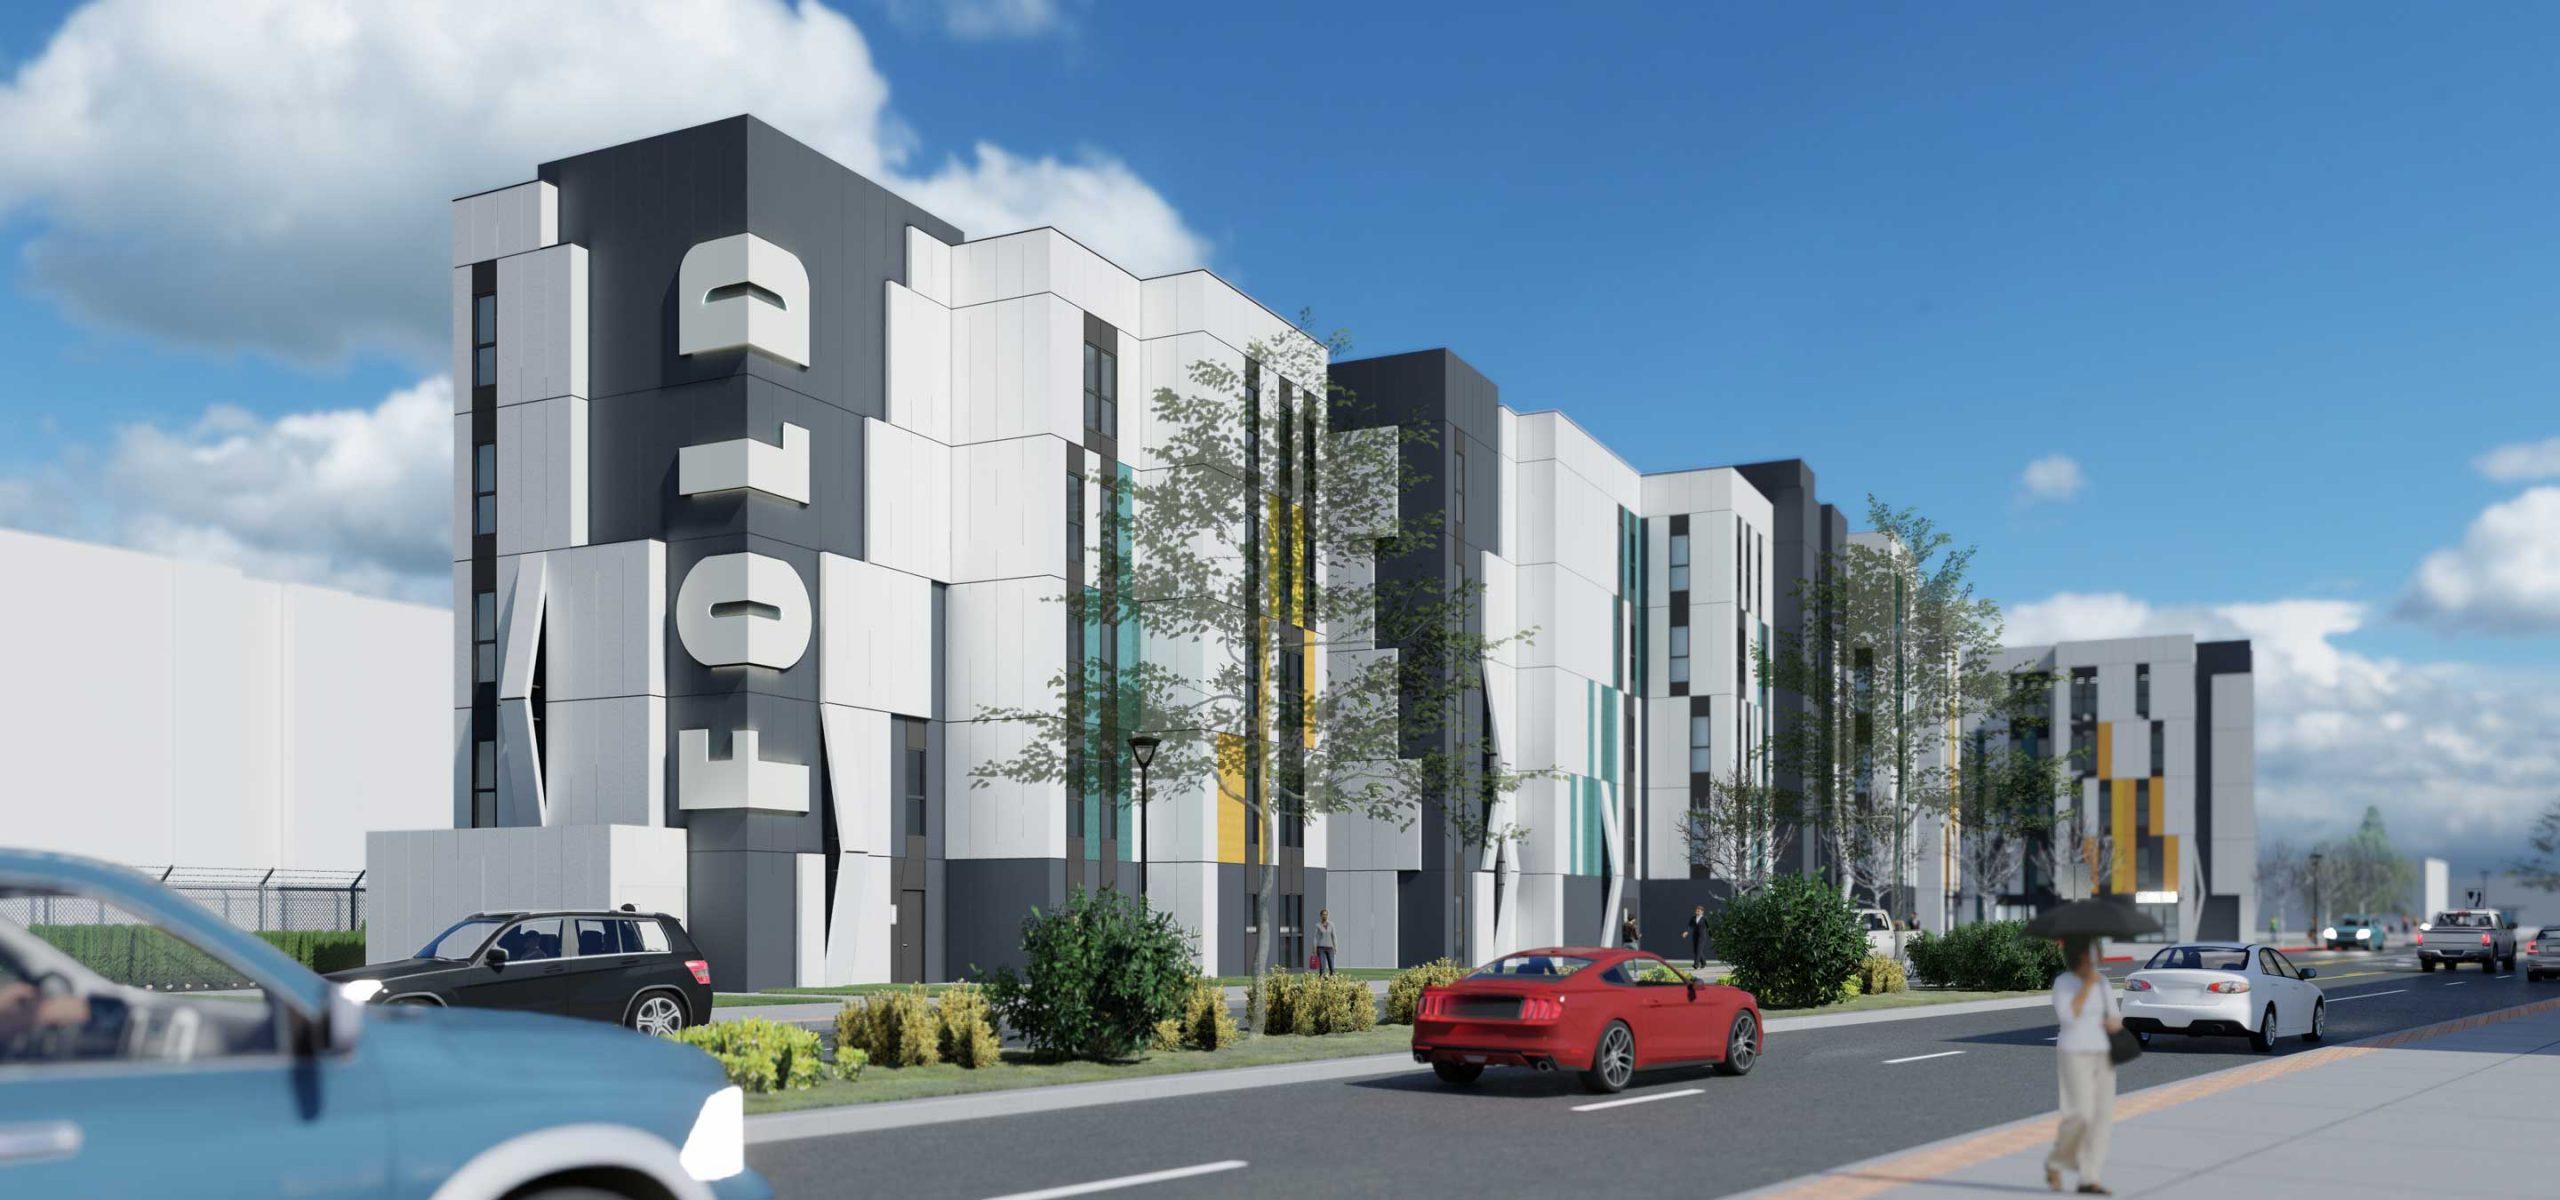 5-story modular apartment building rendering